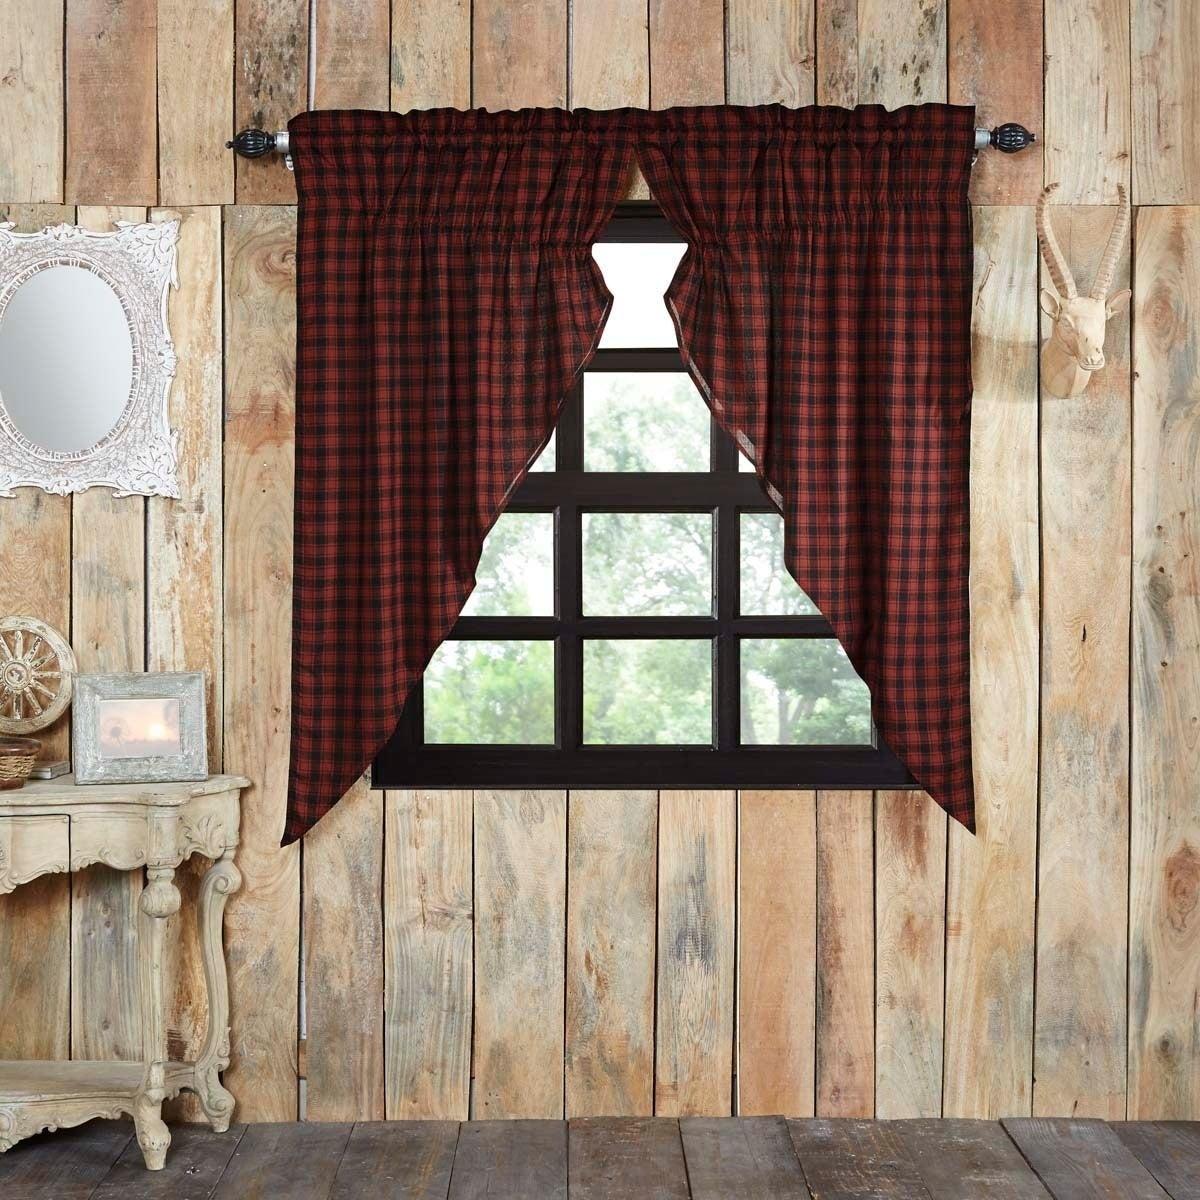 Red Rustic Curtains Vhc Cumberland Prairie Panel Pair Rod Pocket Cotton Buffalo Check – Prairie Panel 63X36 Intended For Cumberland Tier Pair Rod Pocket Cotton Buffalo Check Kitchen Curtains (View 18 of 20)